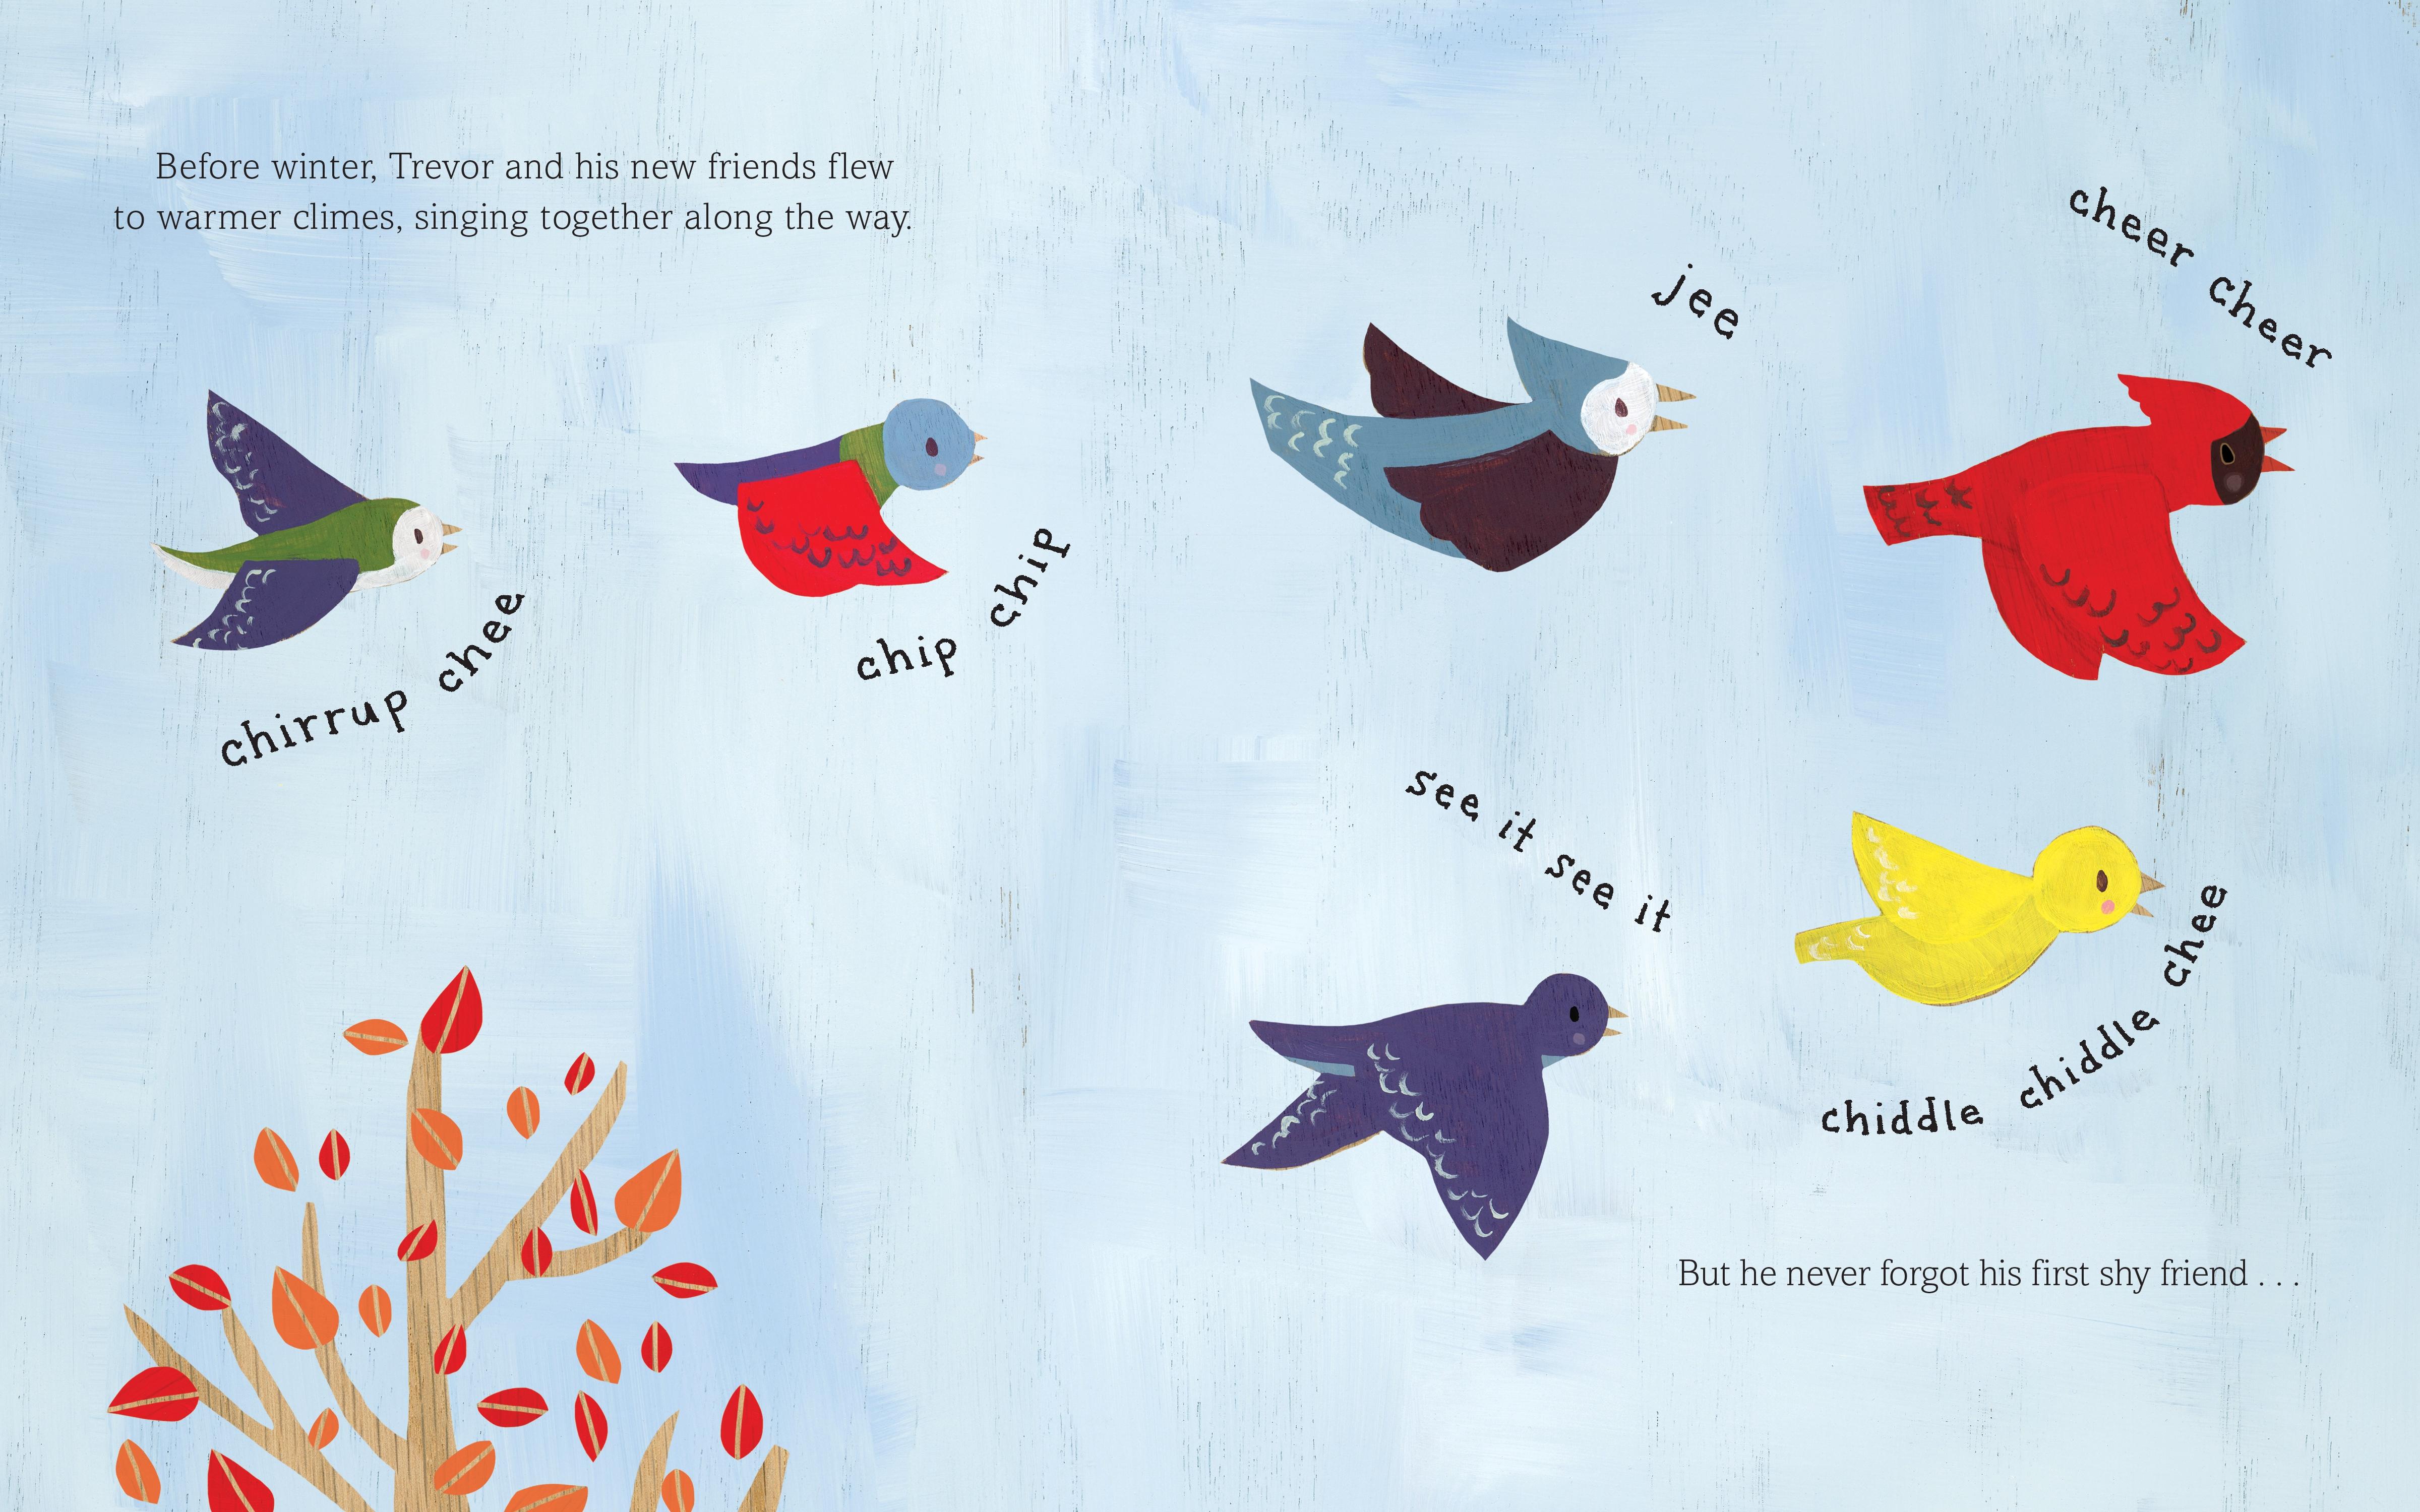 celebrate-picture-books-picture-book-review-trevor-new-friends